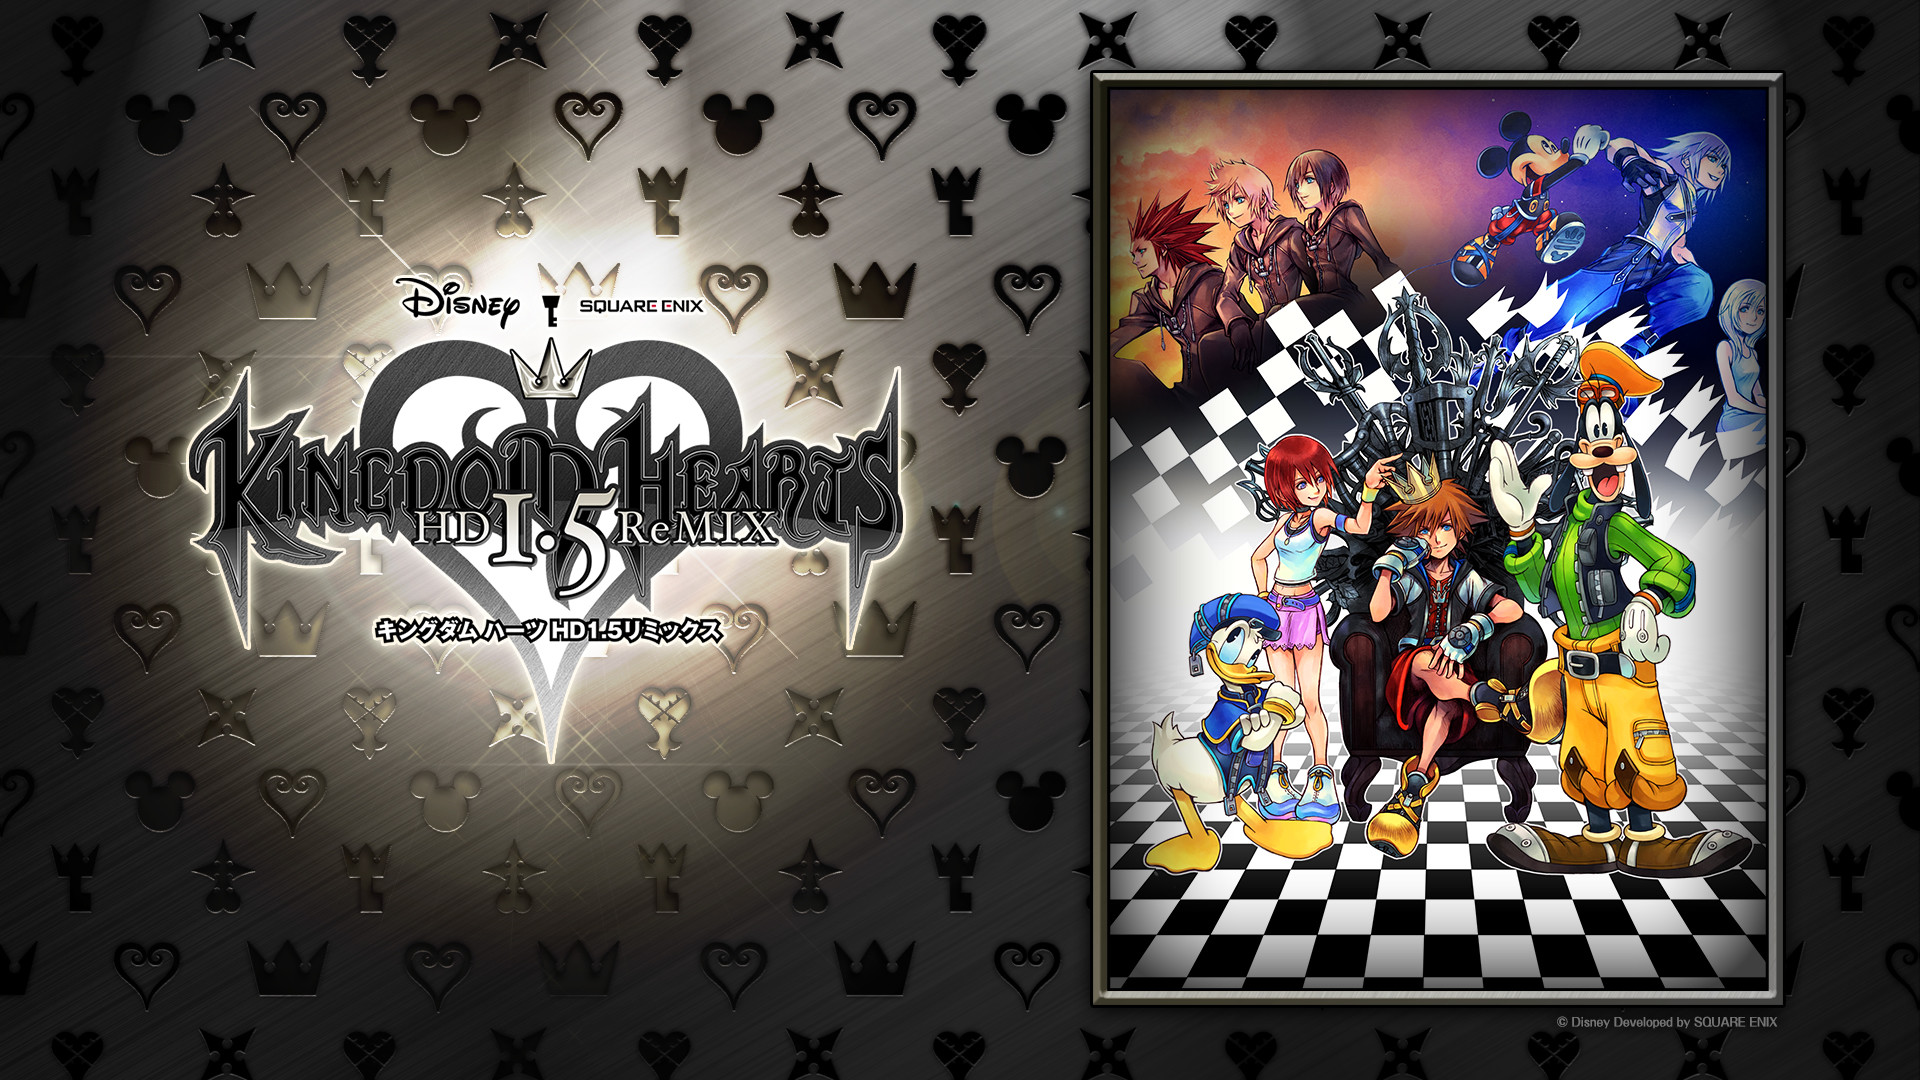 KINGDOM HEARTS -HD 1.5 ReMIX- Fan Campaign CM, Assorted Clips, & New  Wallpapers! – News – Kingdom Hearts Insider